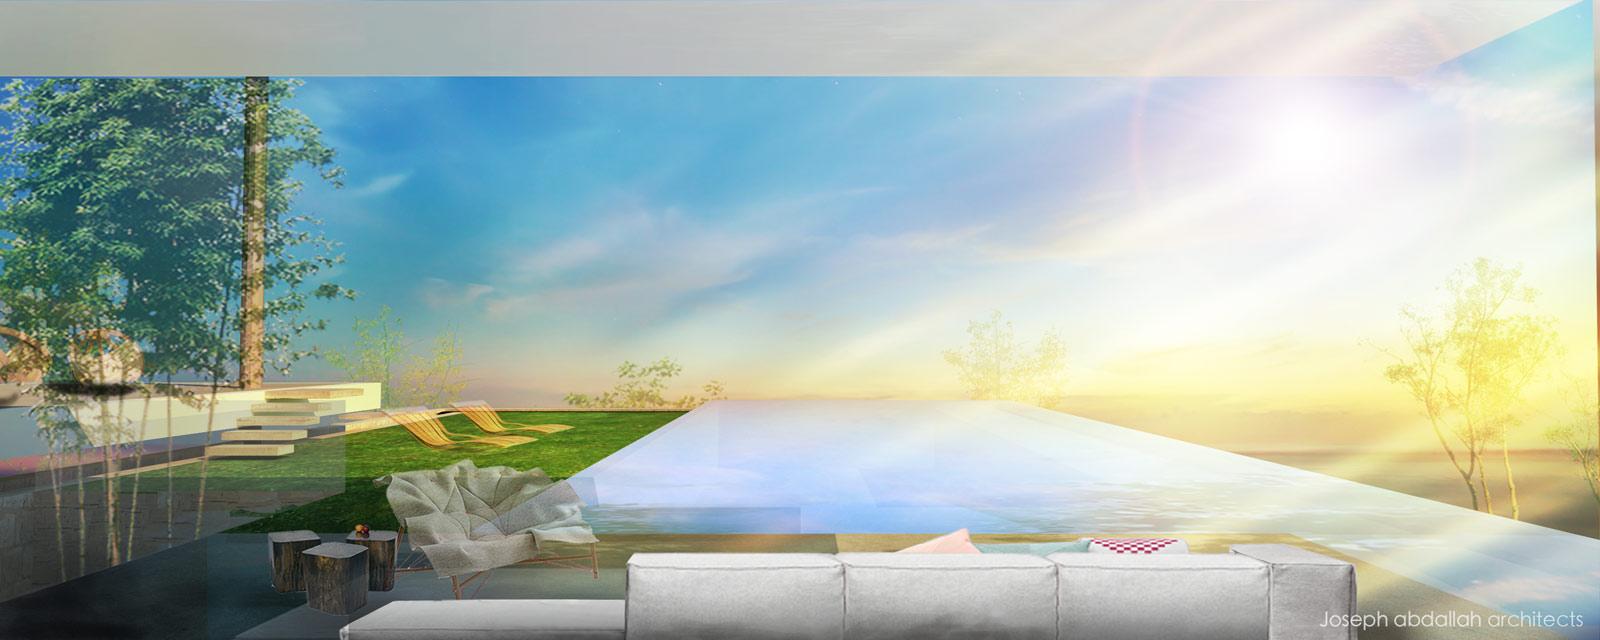 bakhos-nassif-mirror-pool-villa-lebanon-joseph-abdallah-architects-3